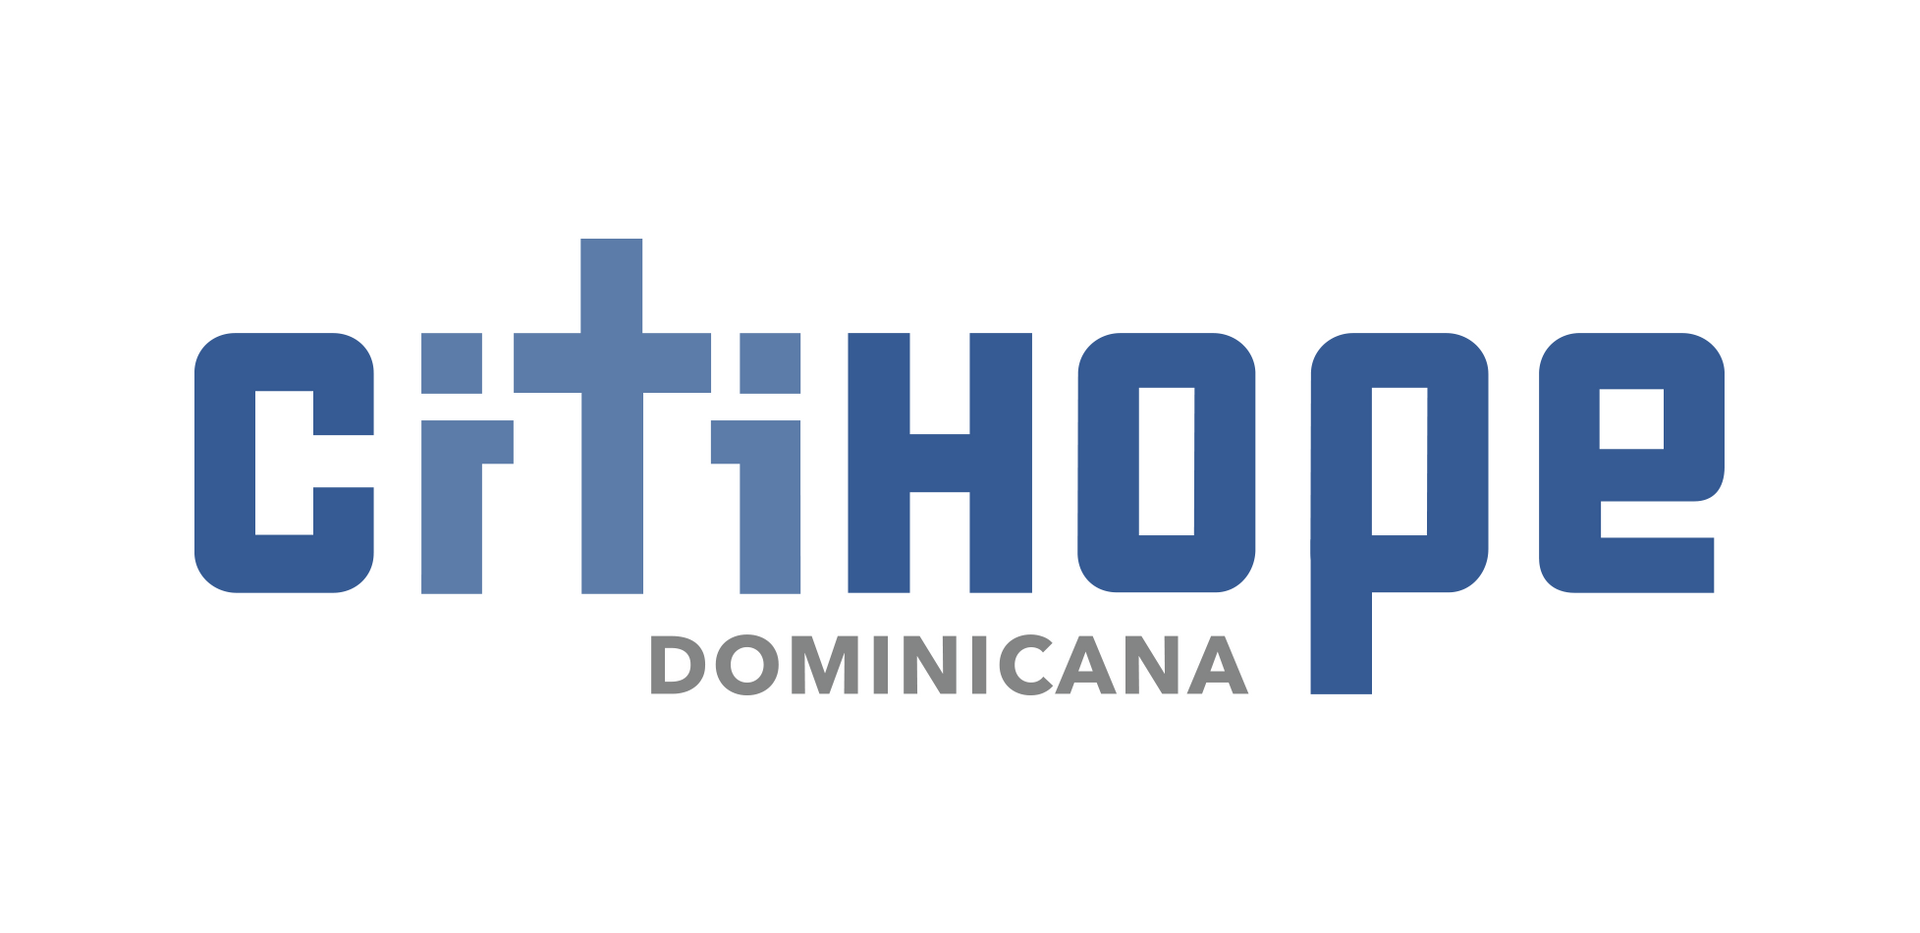 LOGO-dominicana.png